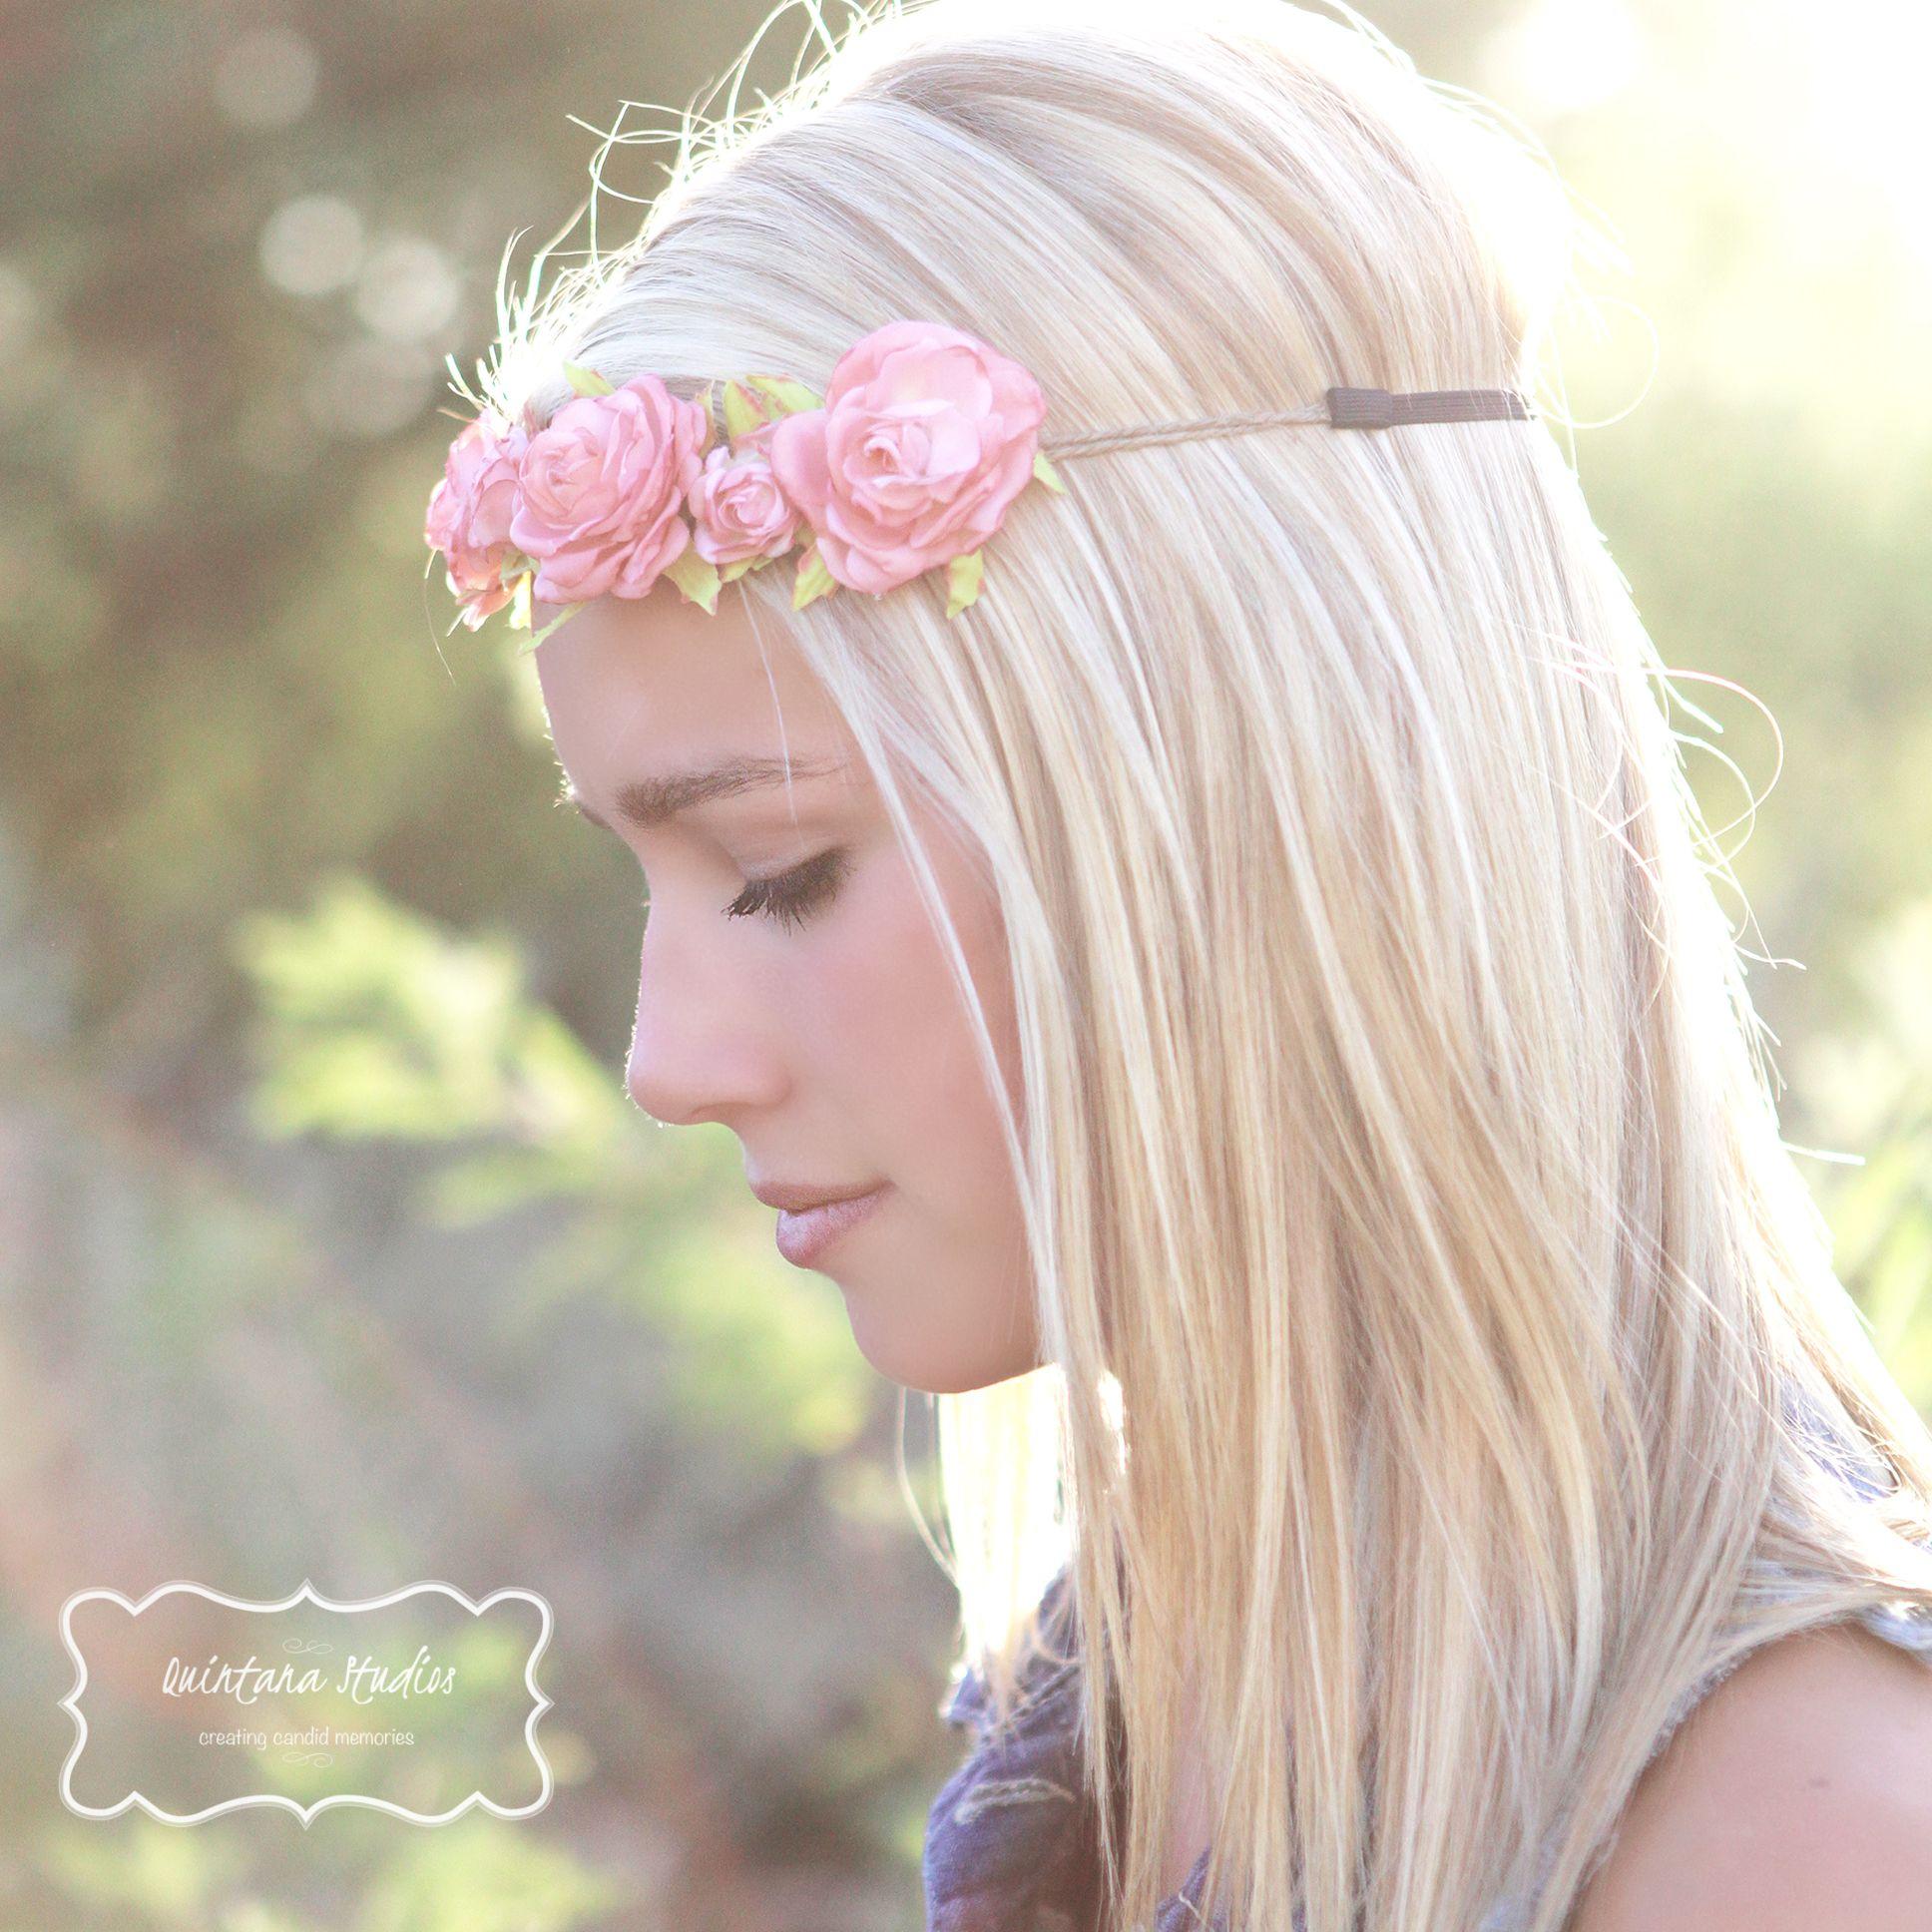 phoenix senior, flower crown, sunlit field